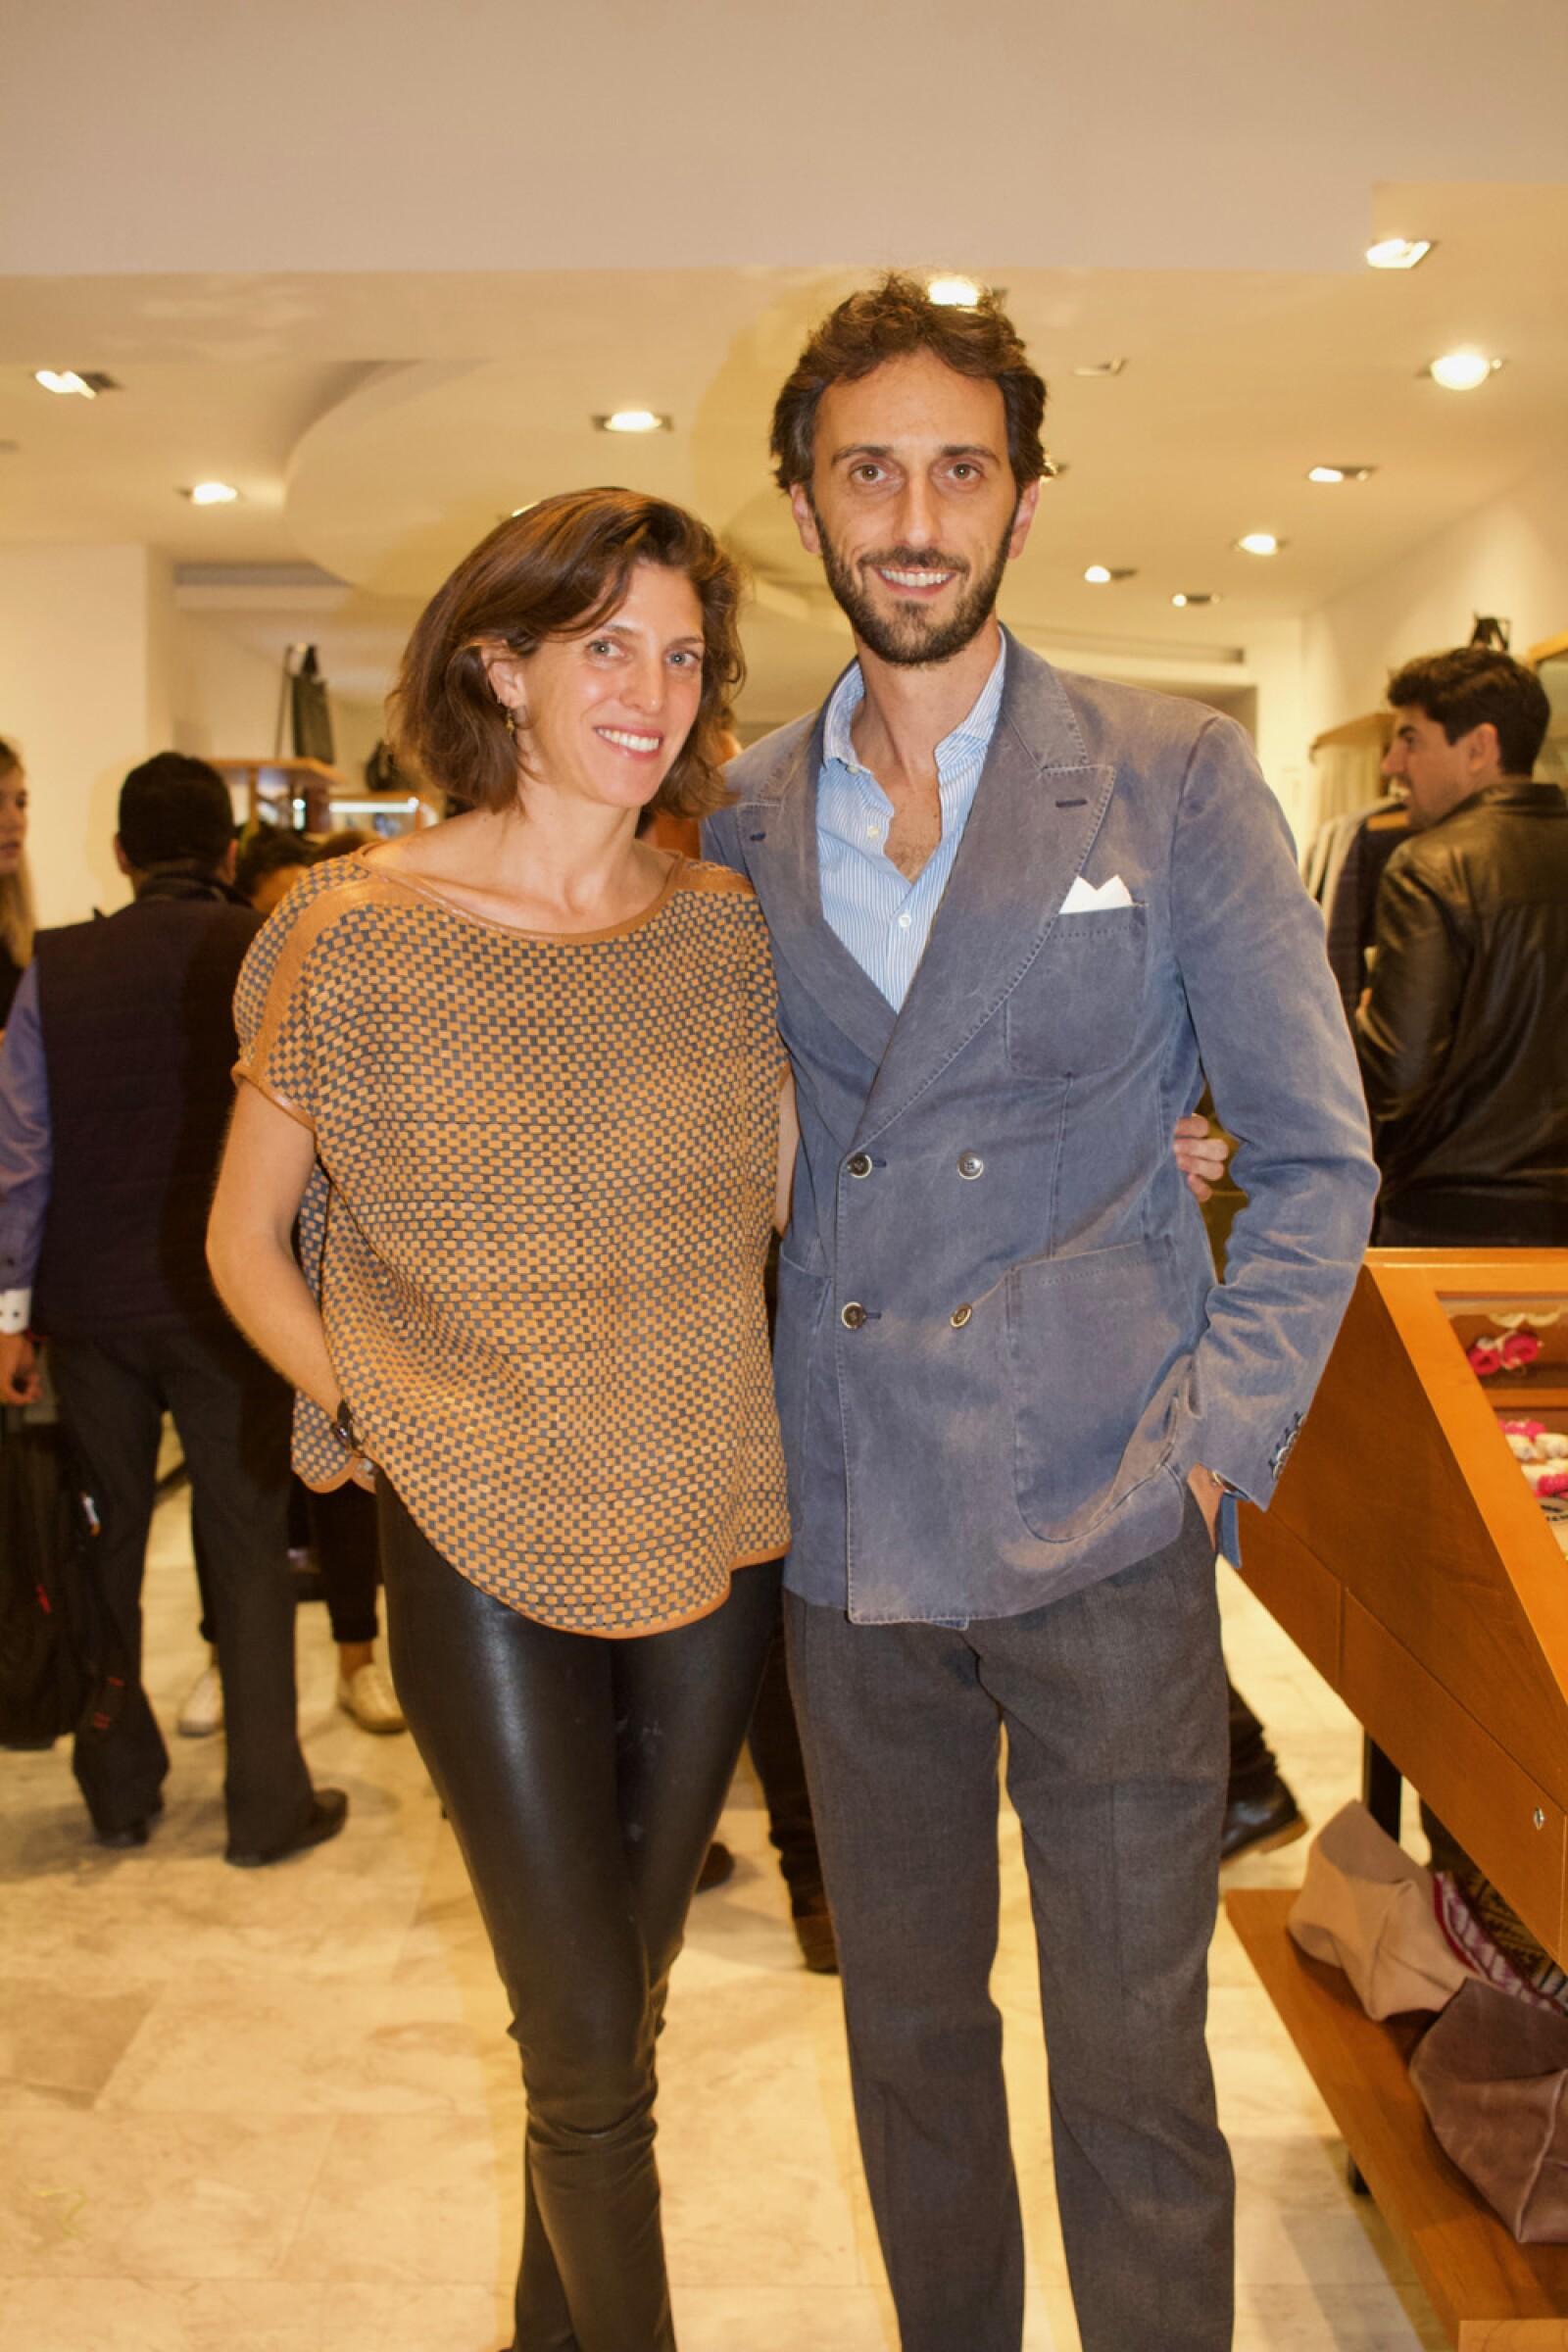 Gina Barros y esposo Alessandro Cerutti 2.jpg